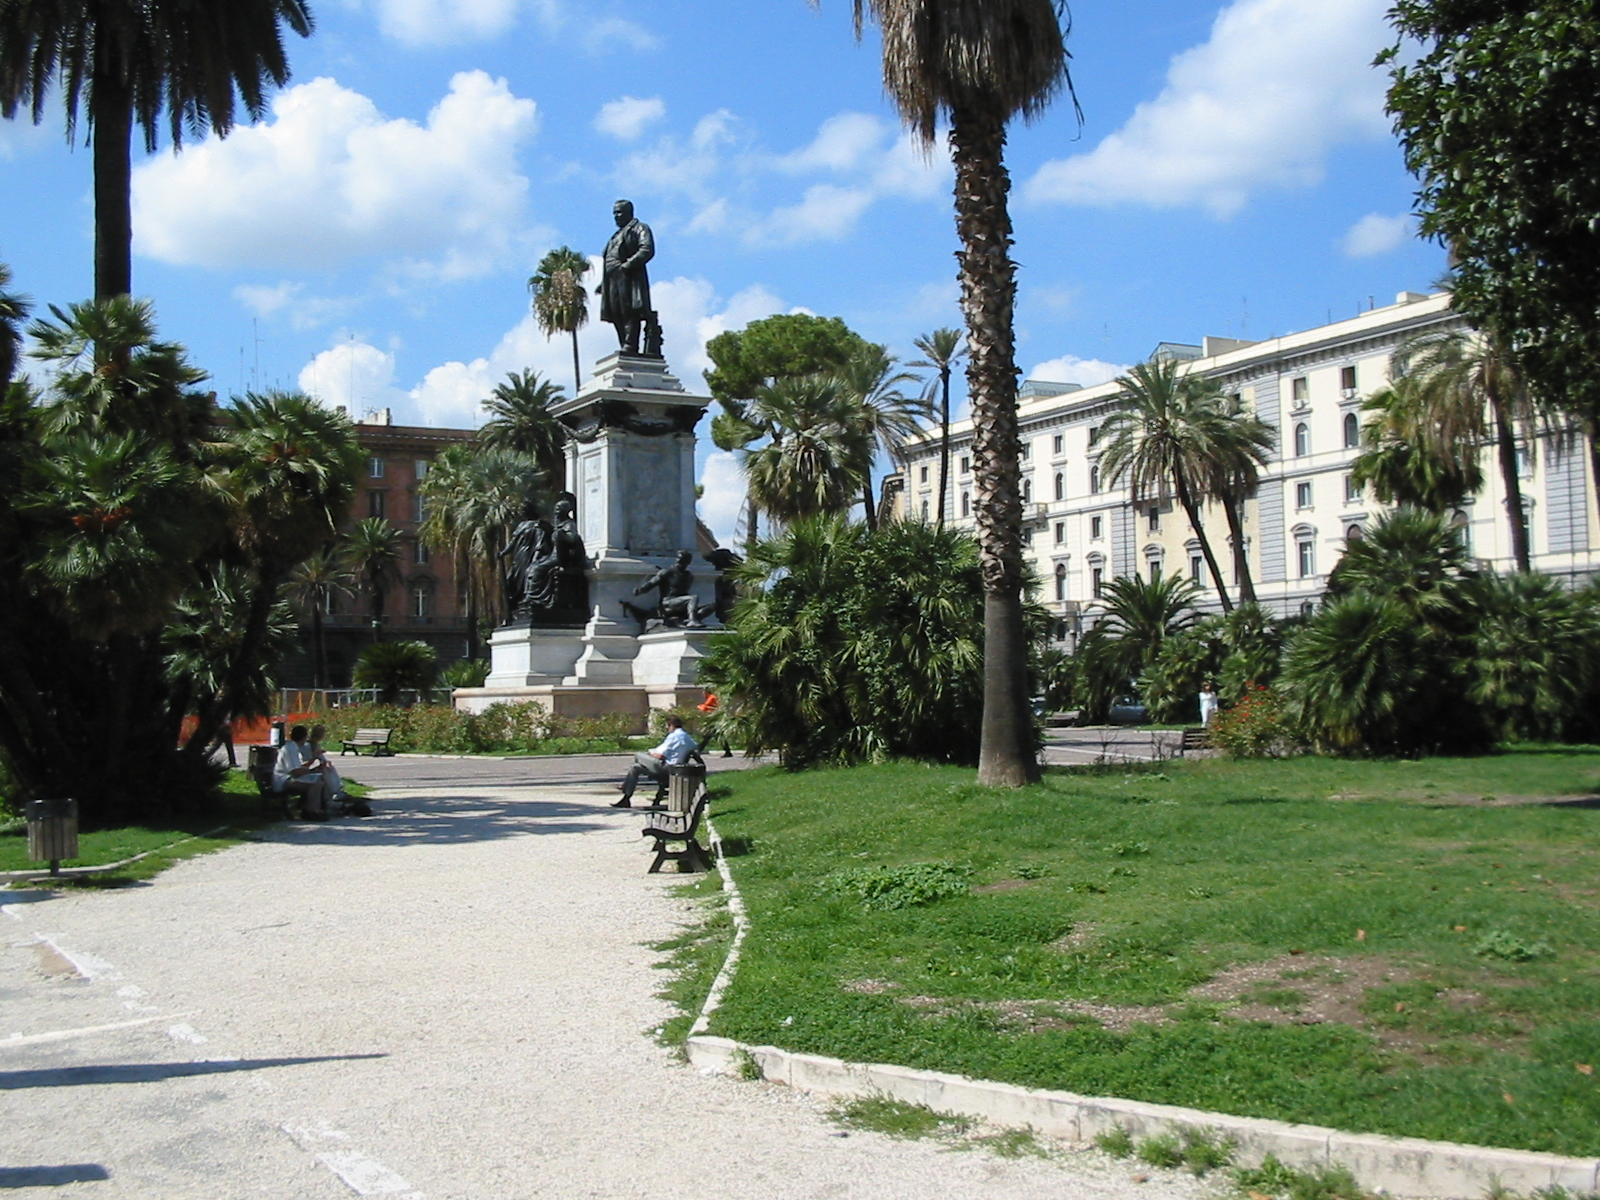 Hotel Quartiere Prati Roma